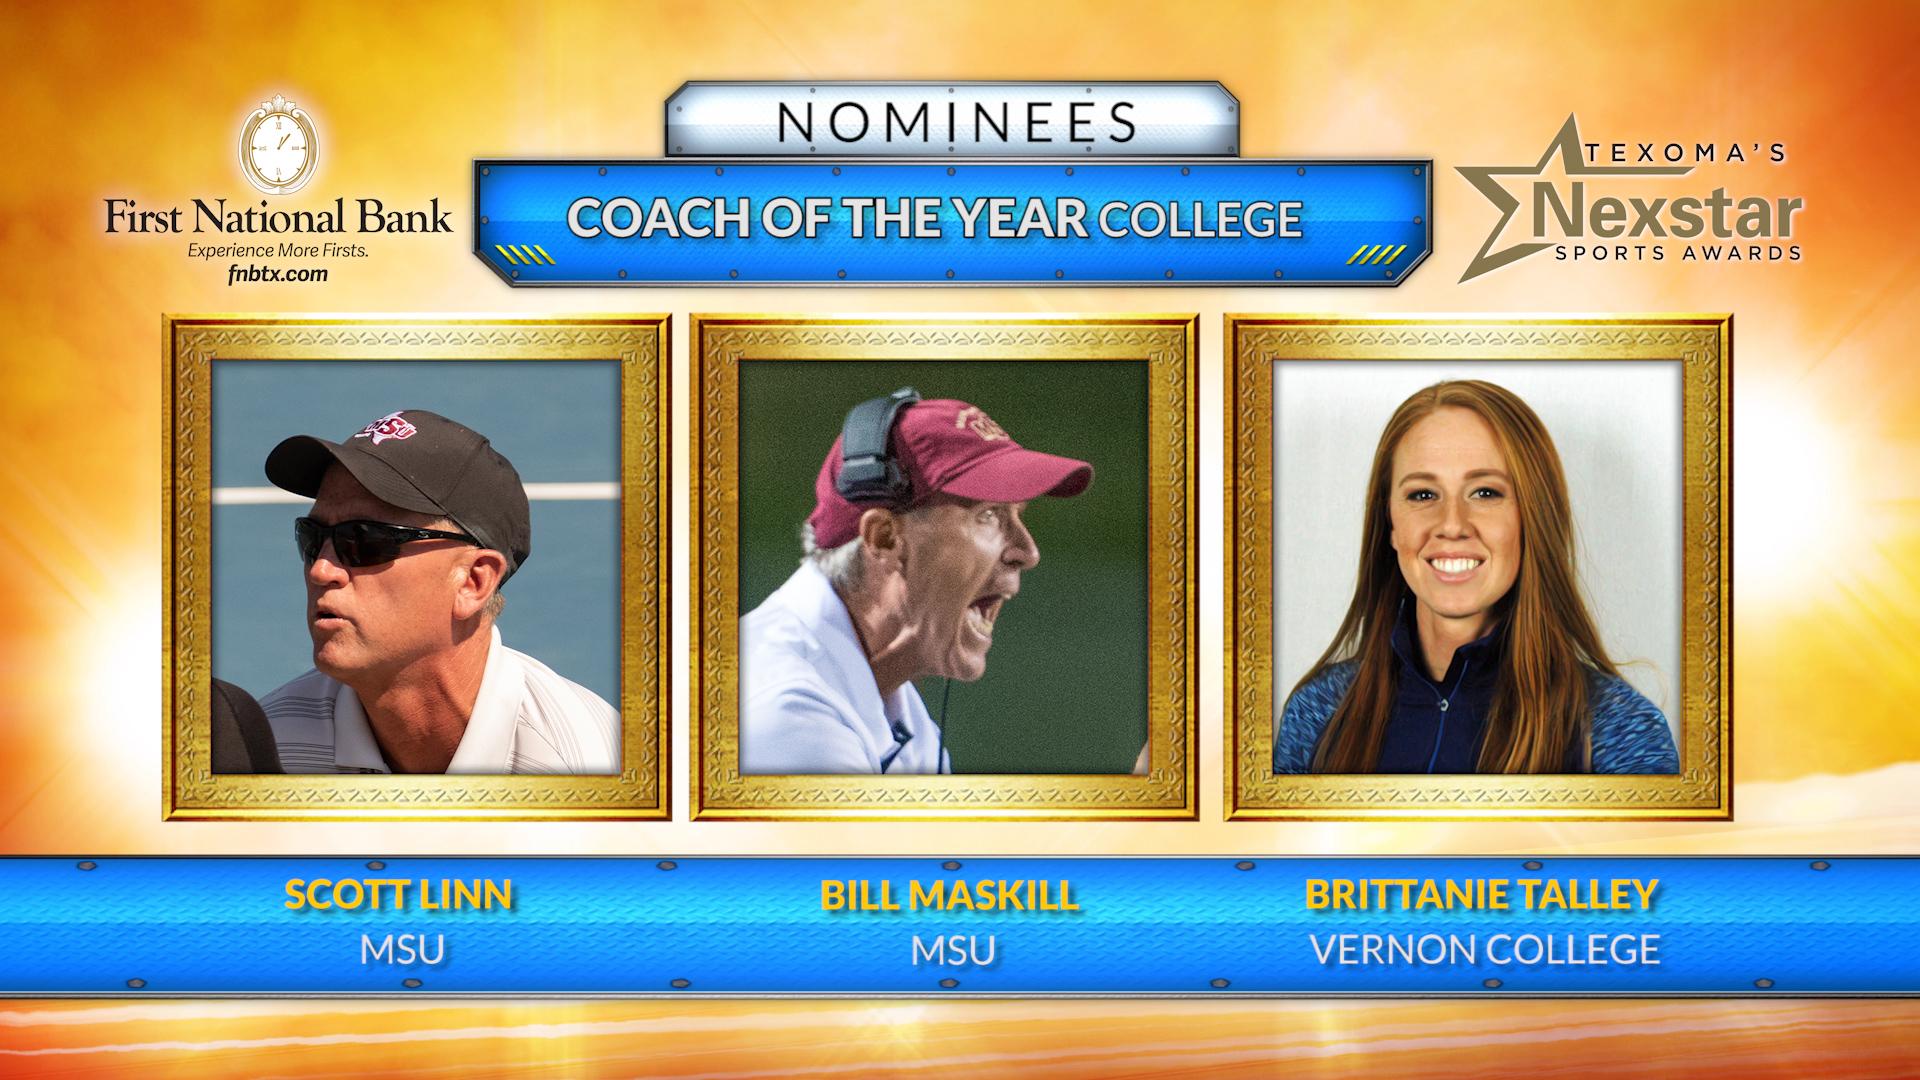 coach of the year college_1560302543375.jpg.jpg